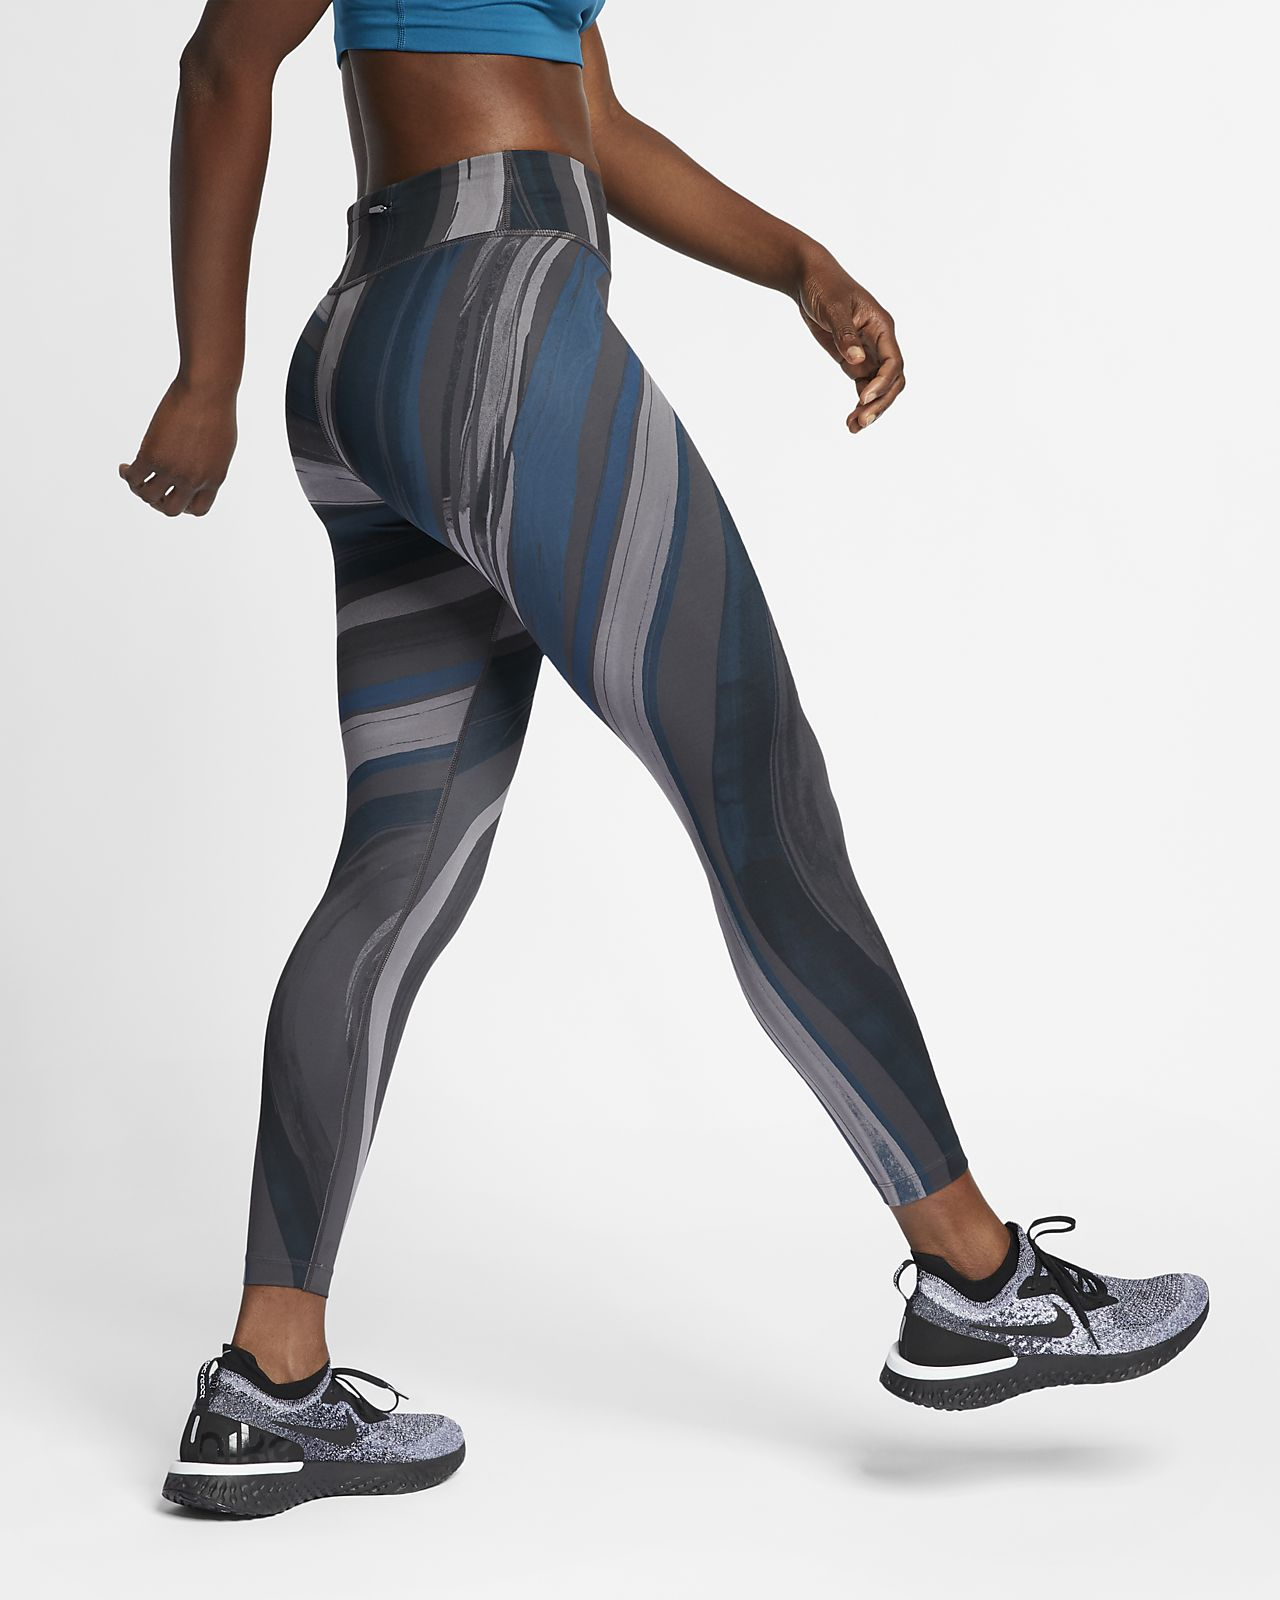 fe2305bf51db Γυναικείο κολάν 7 8 για τρέξιμο Nike Epic Lux. Nike.com GR